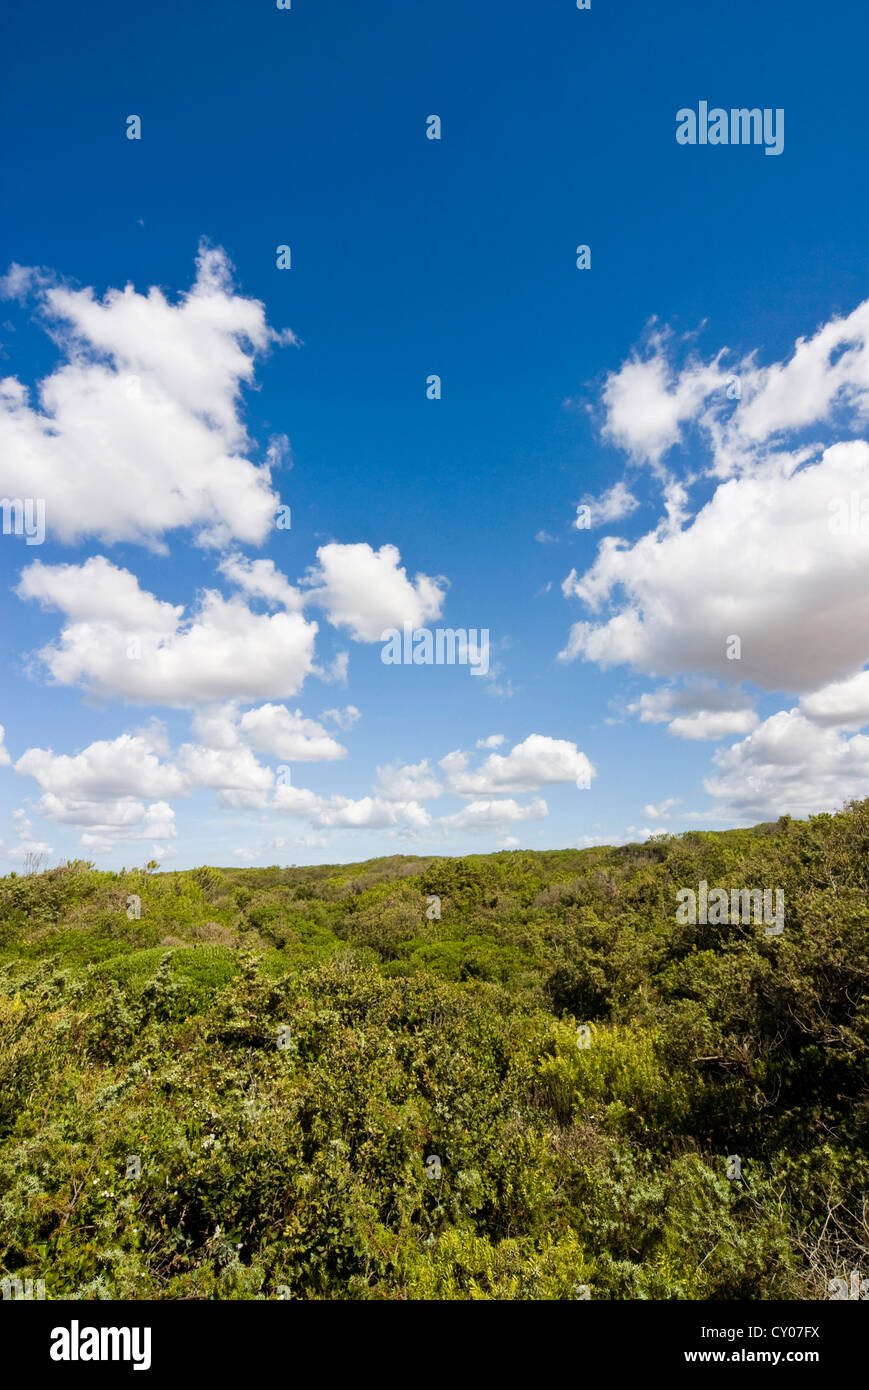 Dunes and Mediterranean bush behind Capalbio Beach, Capalbio, Grosseto Province, Tuscany, Italy - Stock Image